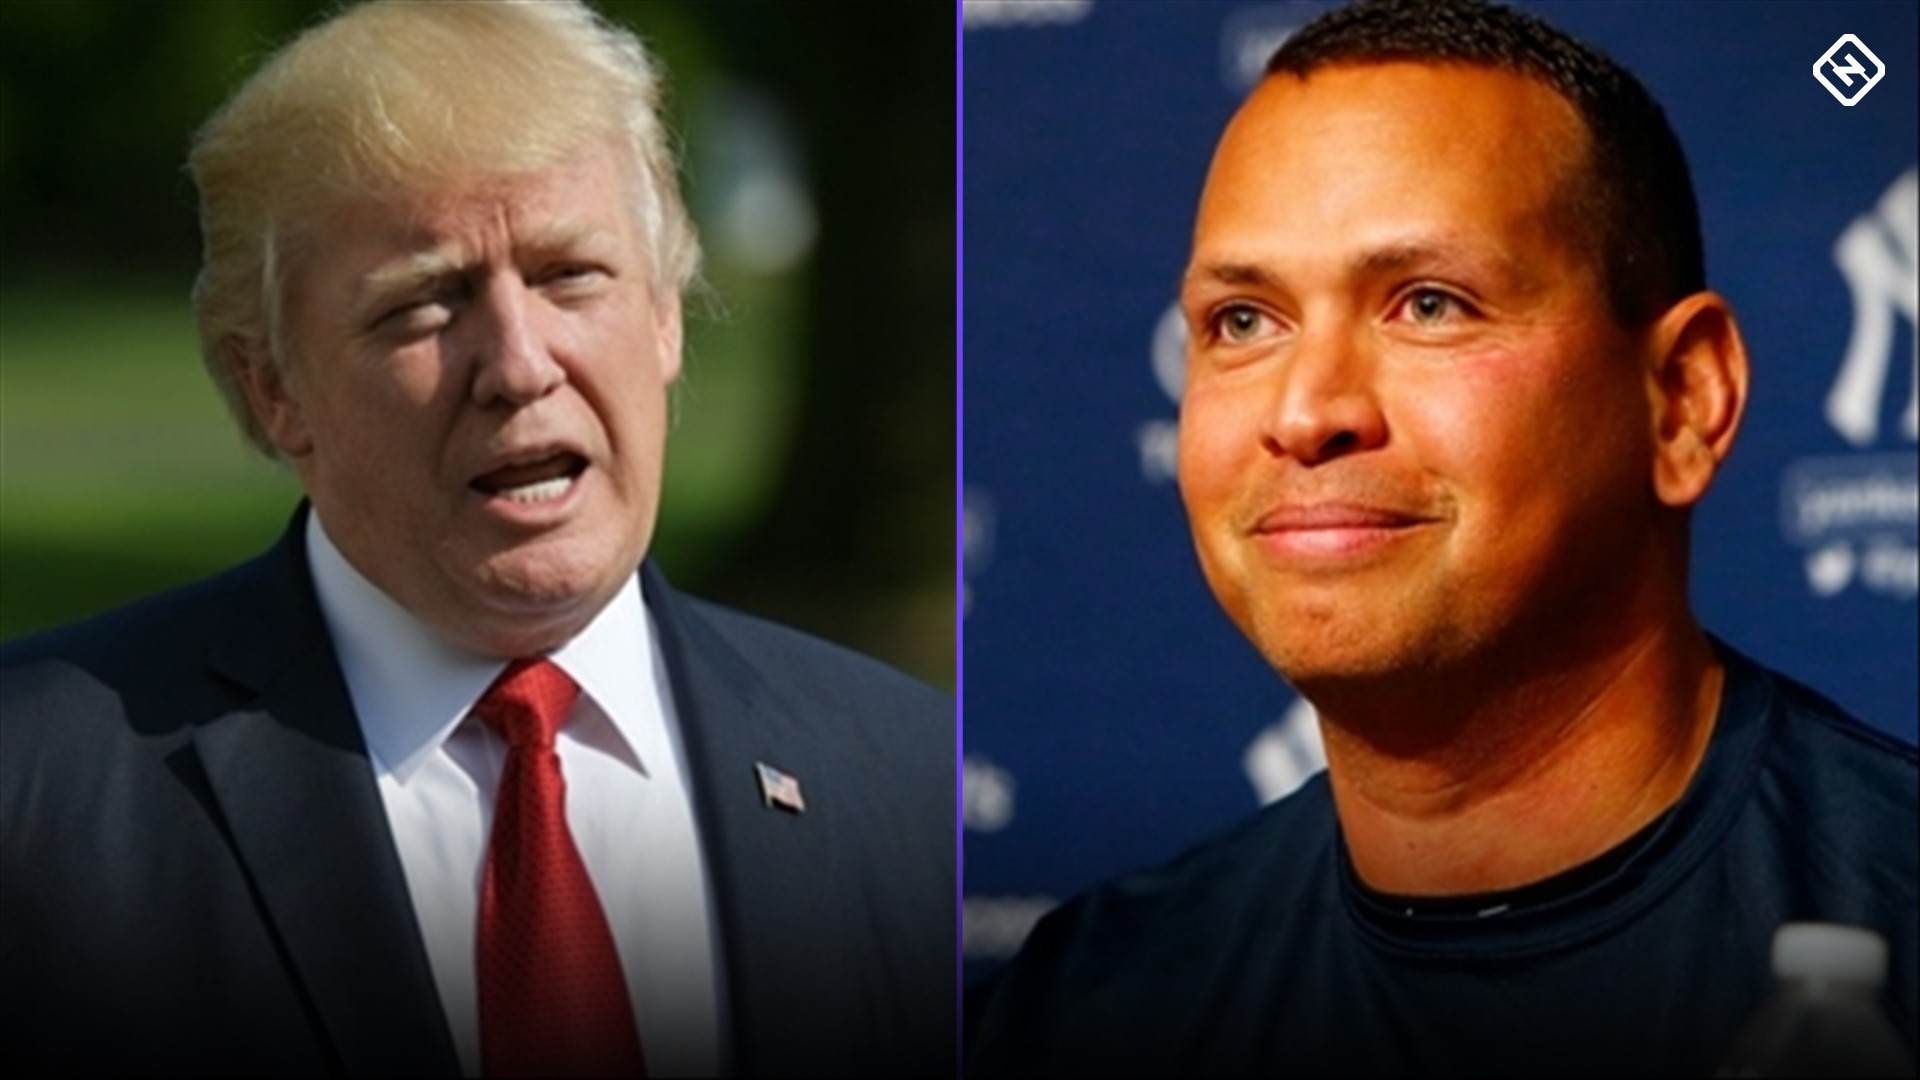 Donald Trump le pidió consejo a Alex Rodríguez sobre la respuesta al coronavirus, según un informe 73